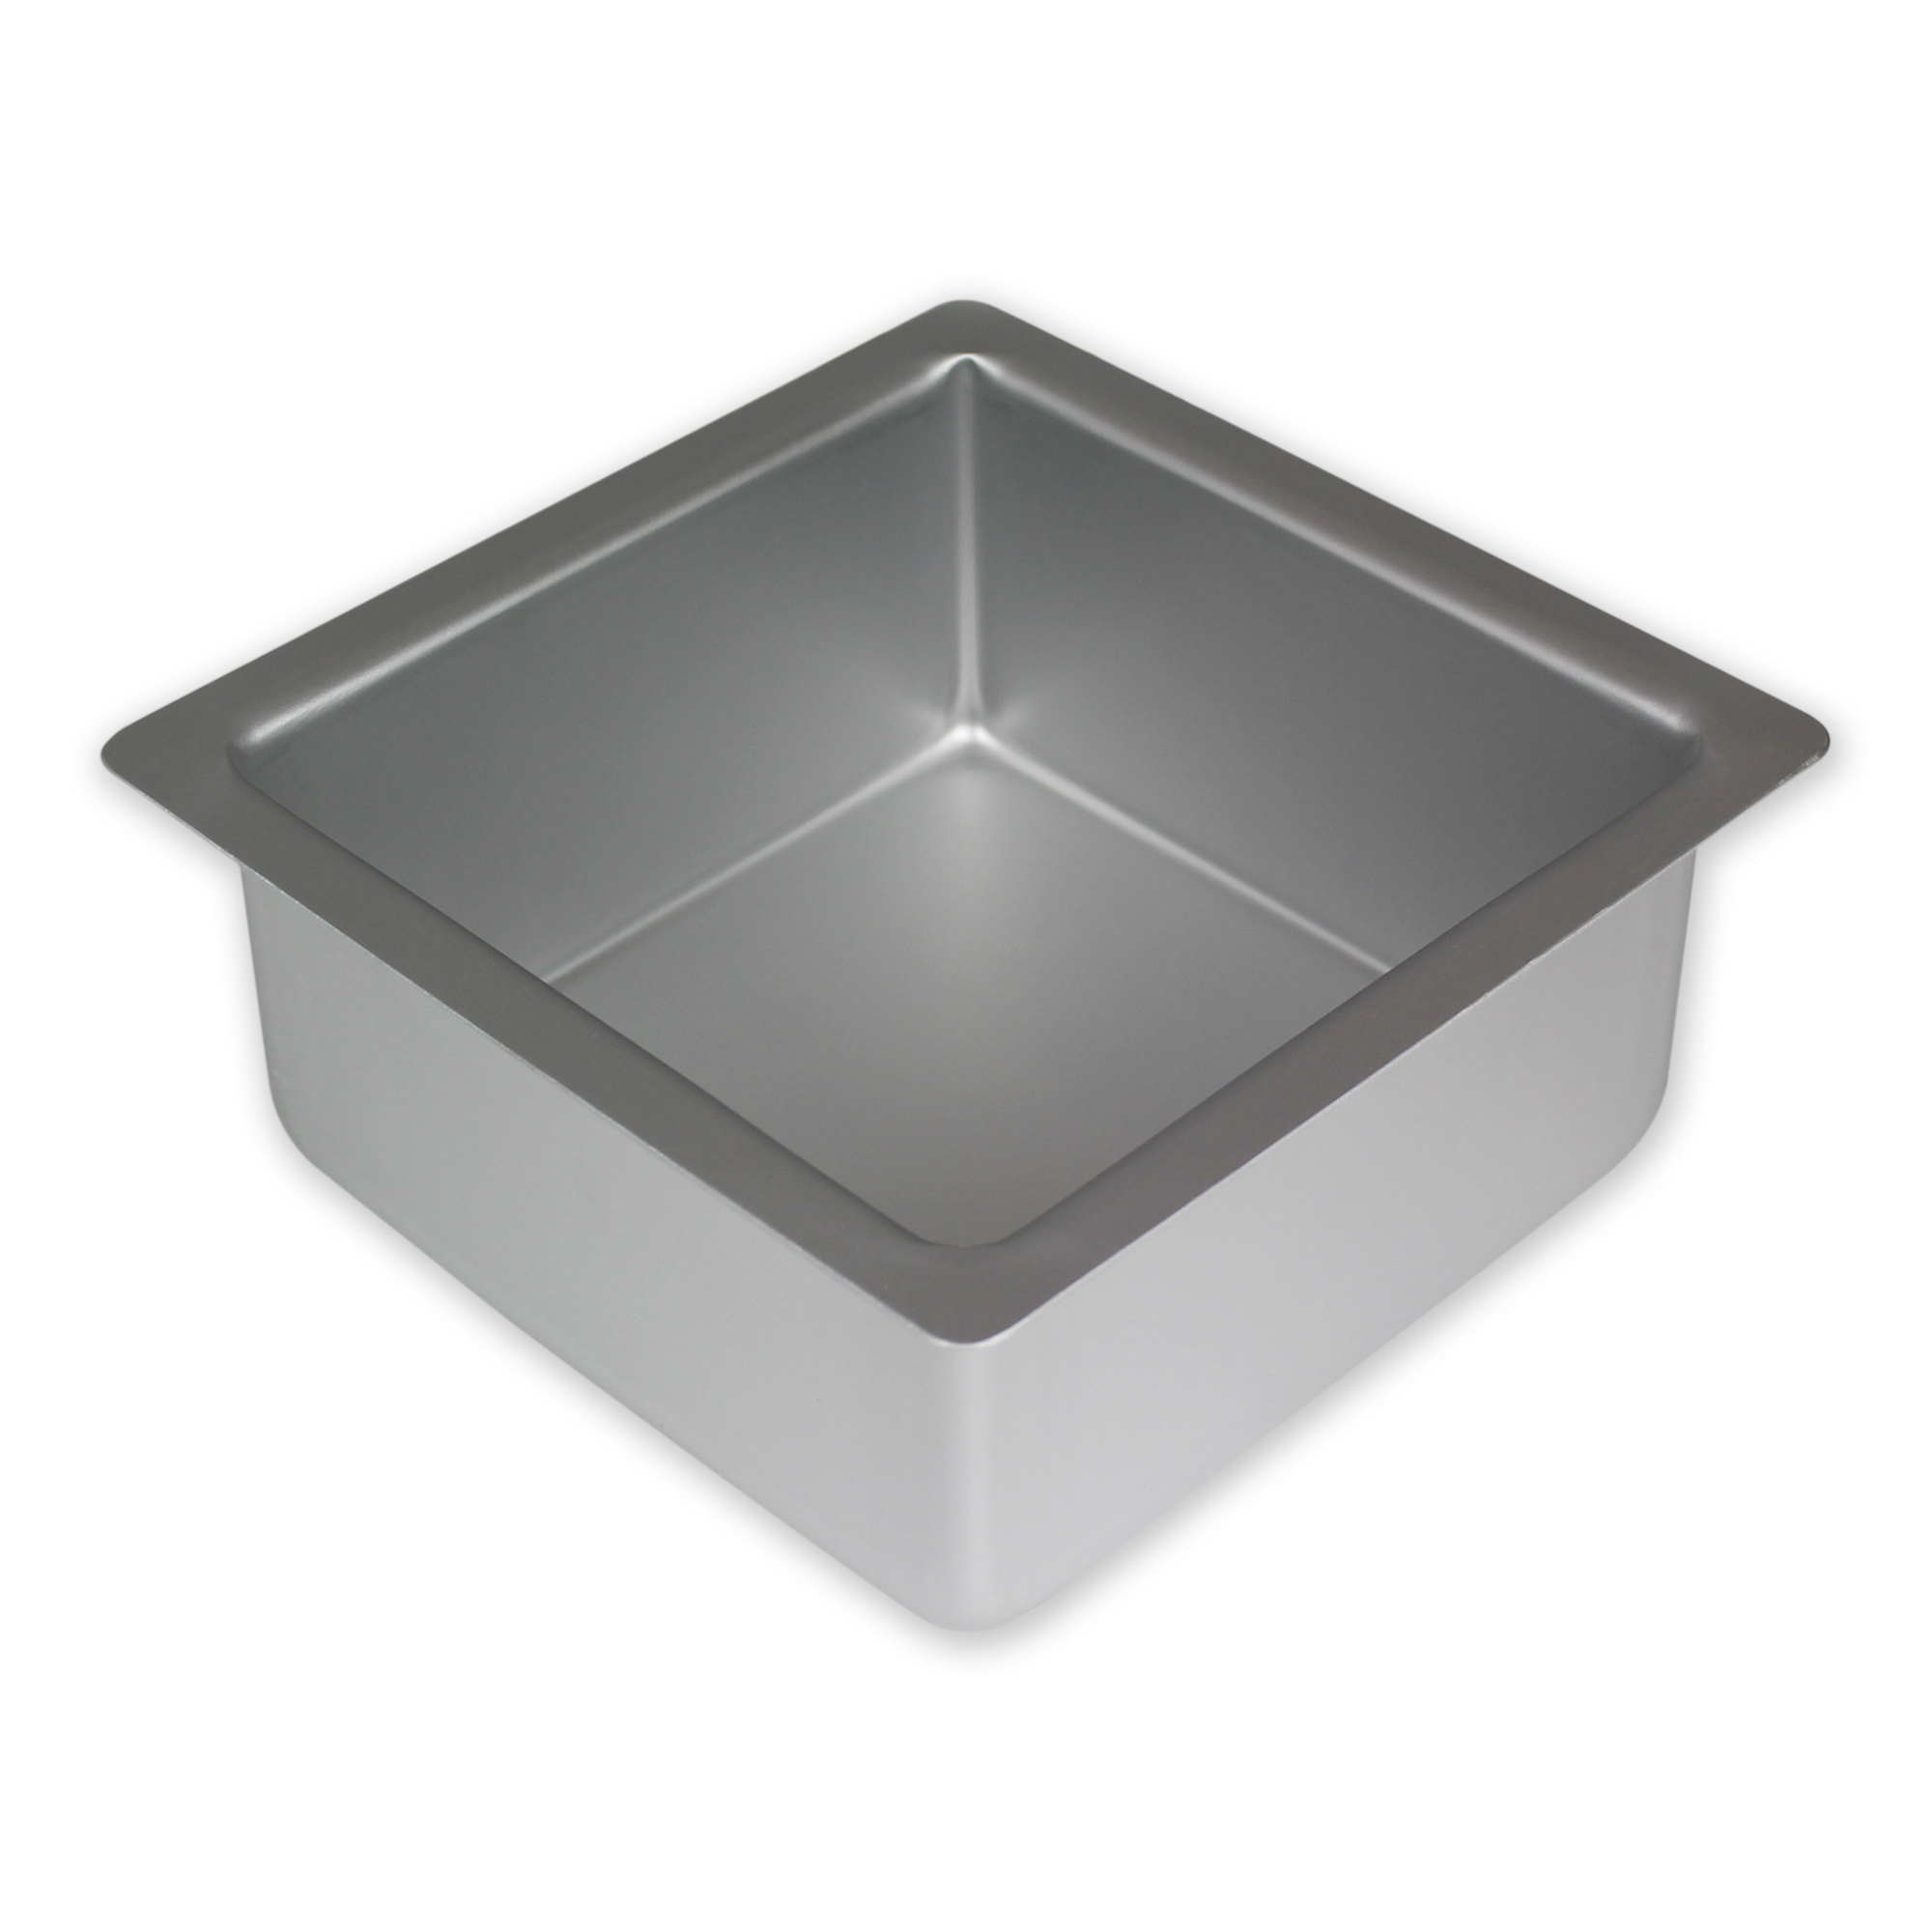 "PME plaza en forma de Molde Para Torta Molde De Hornear Boda 3/"" 4/"" profundo muchos Tamaños"